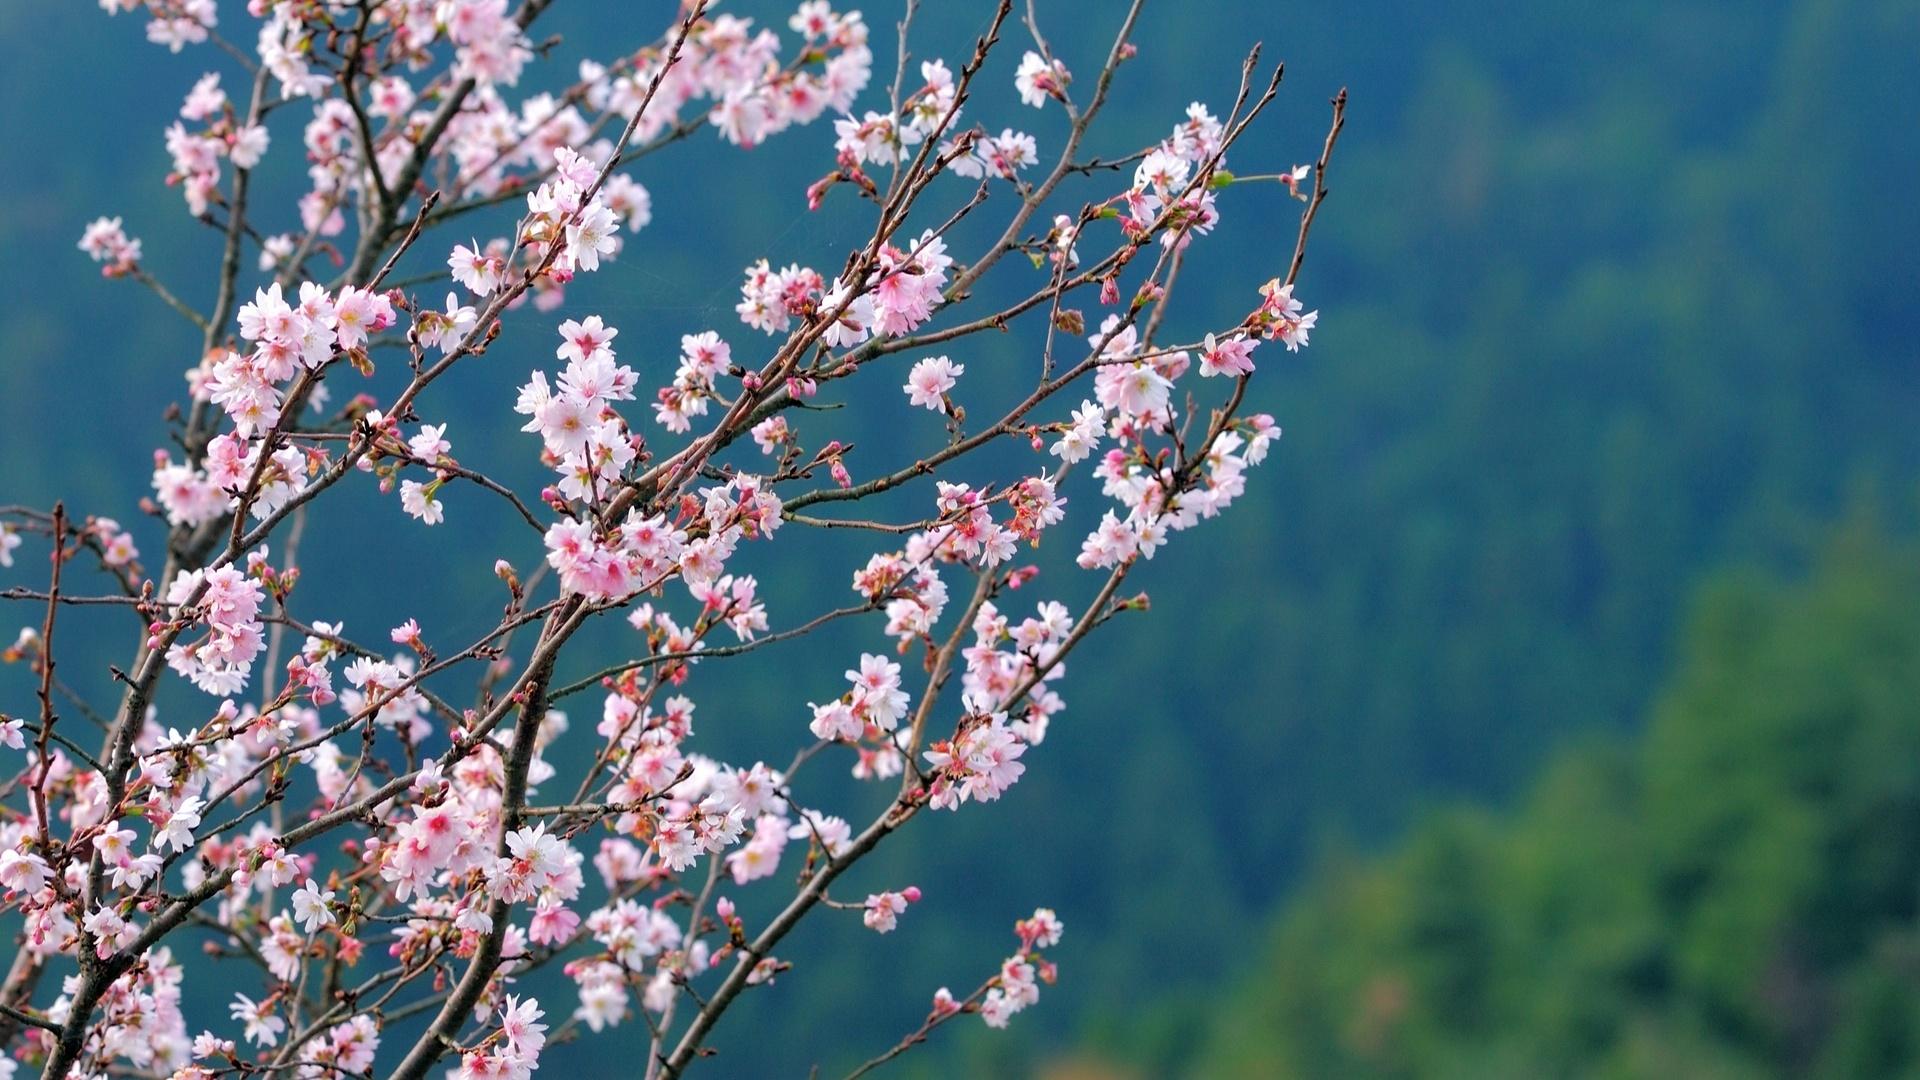 Sakura Blossom wallpaper for computer